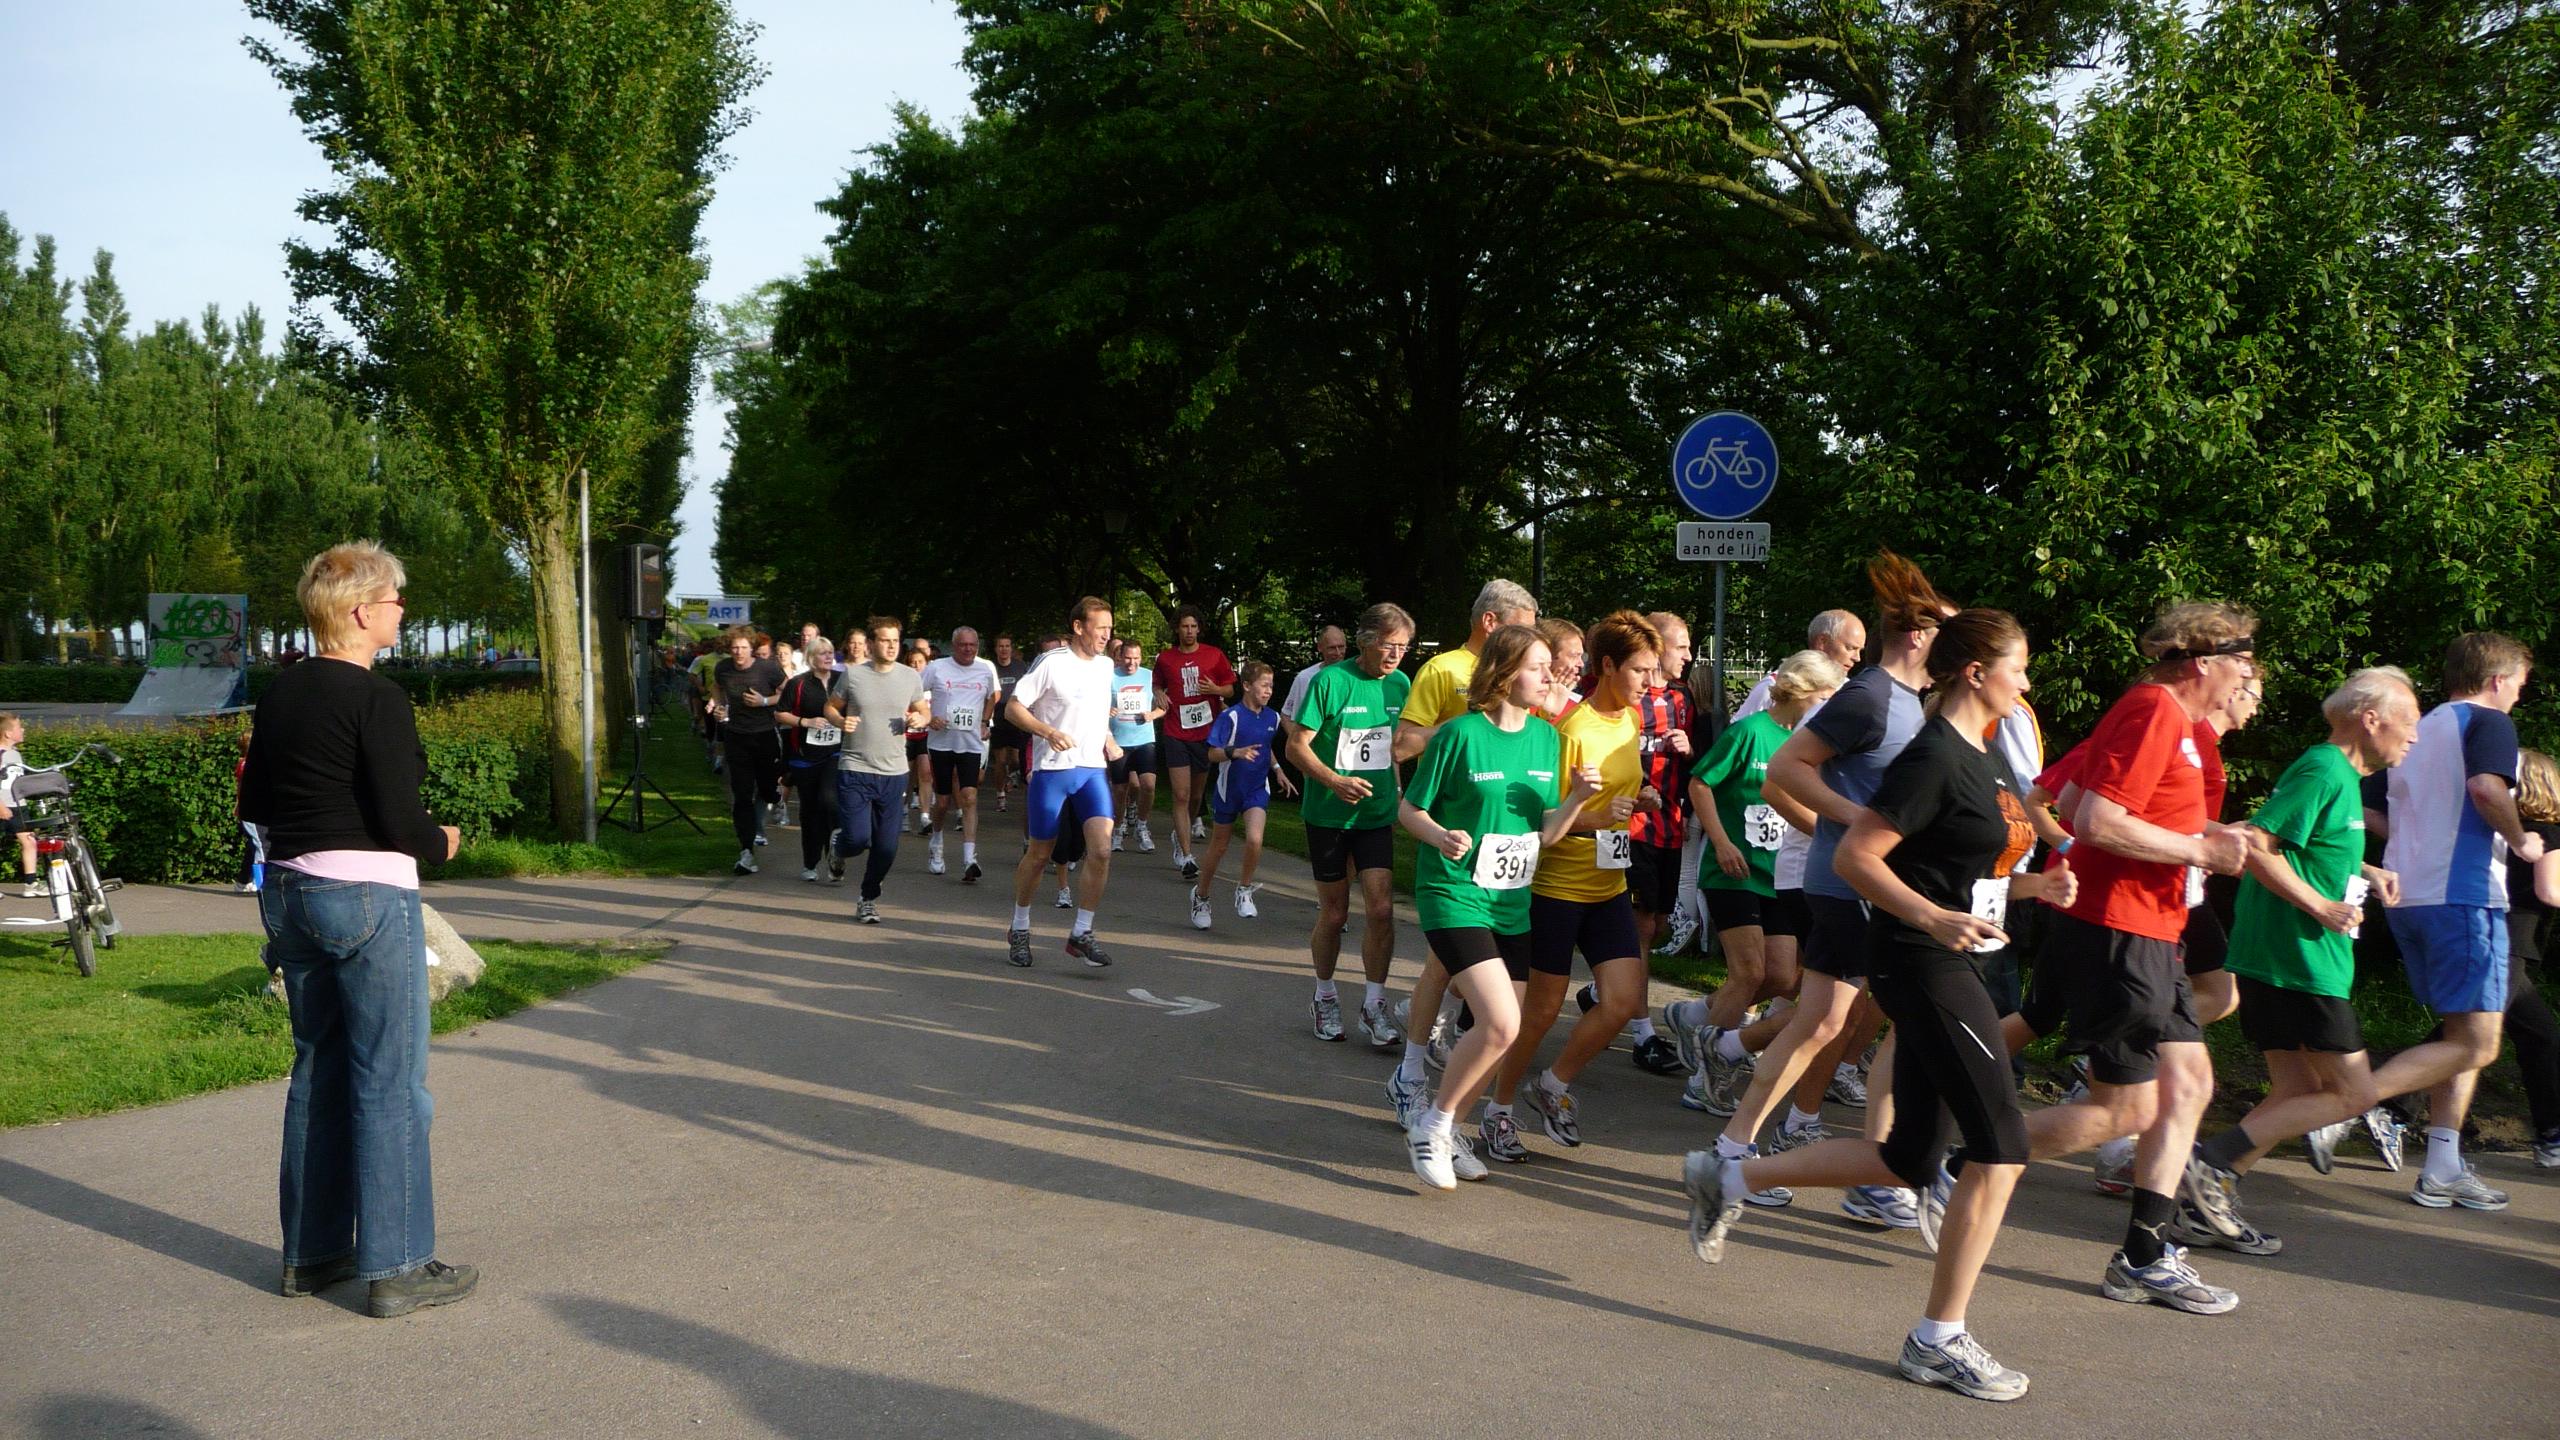 7 mei starten de 25e wijkenlopen in Hoorn